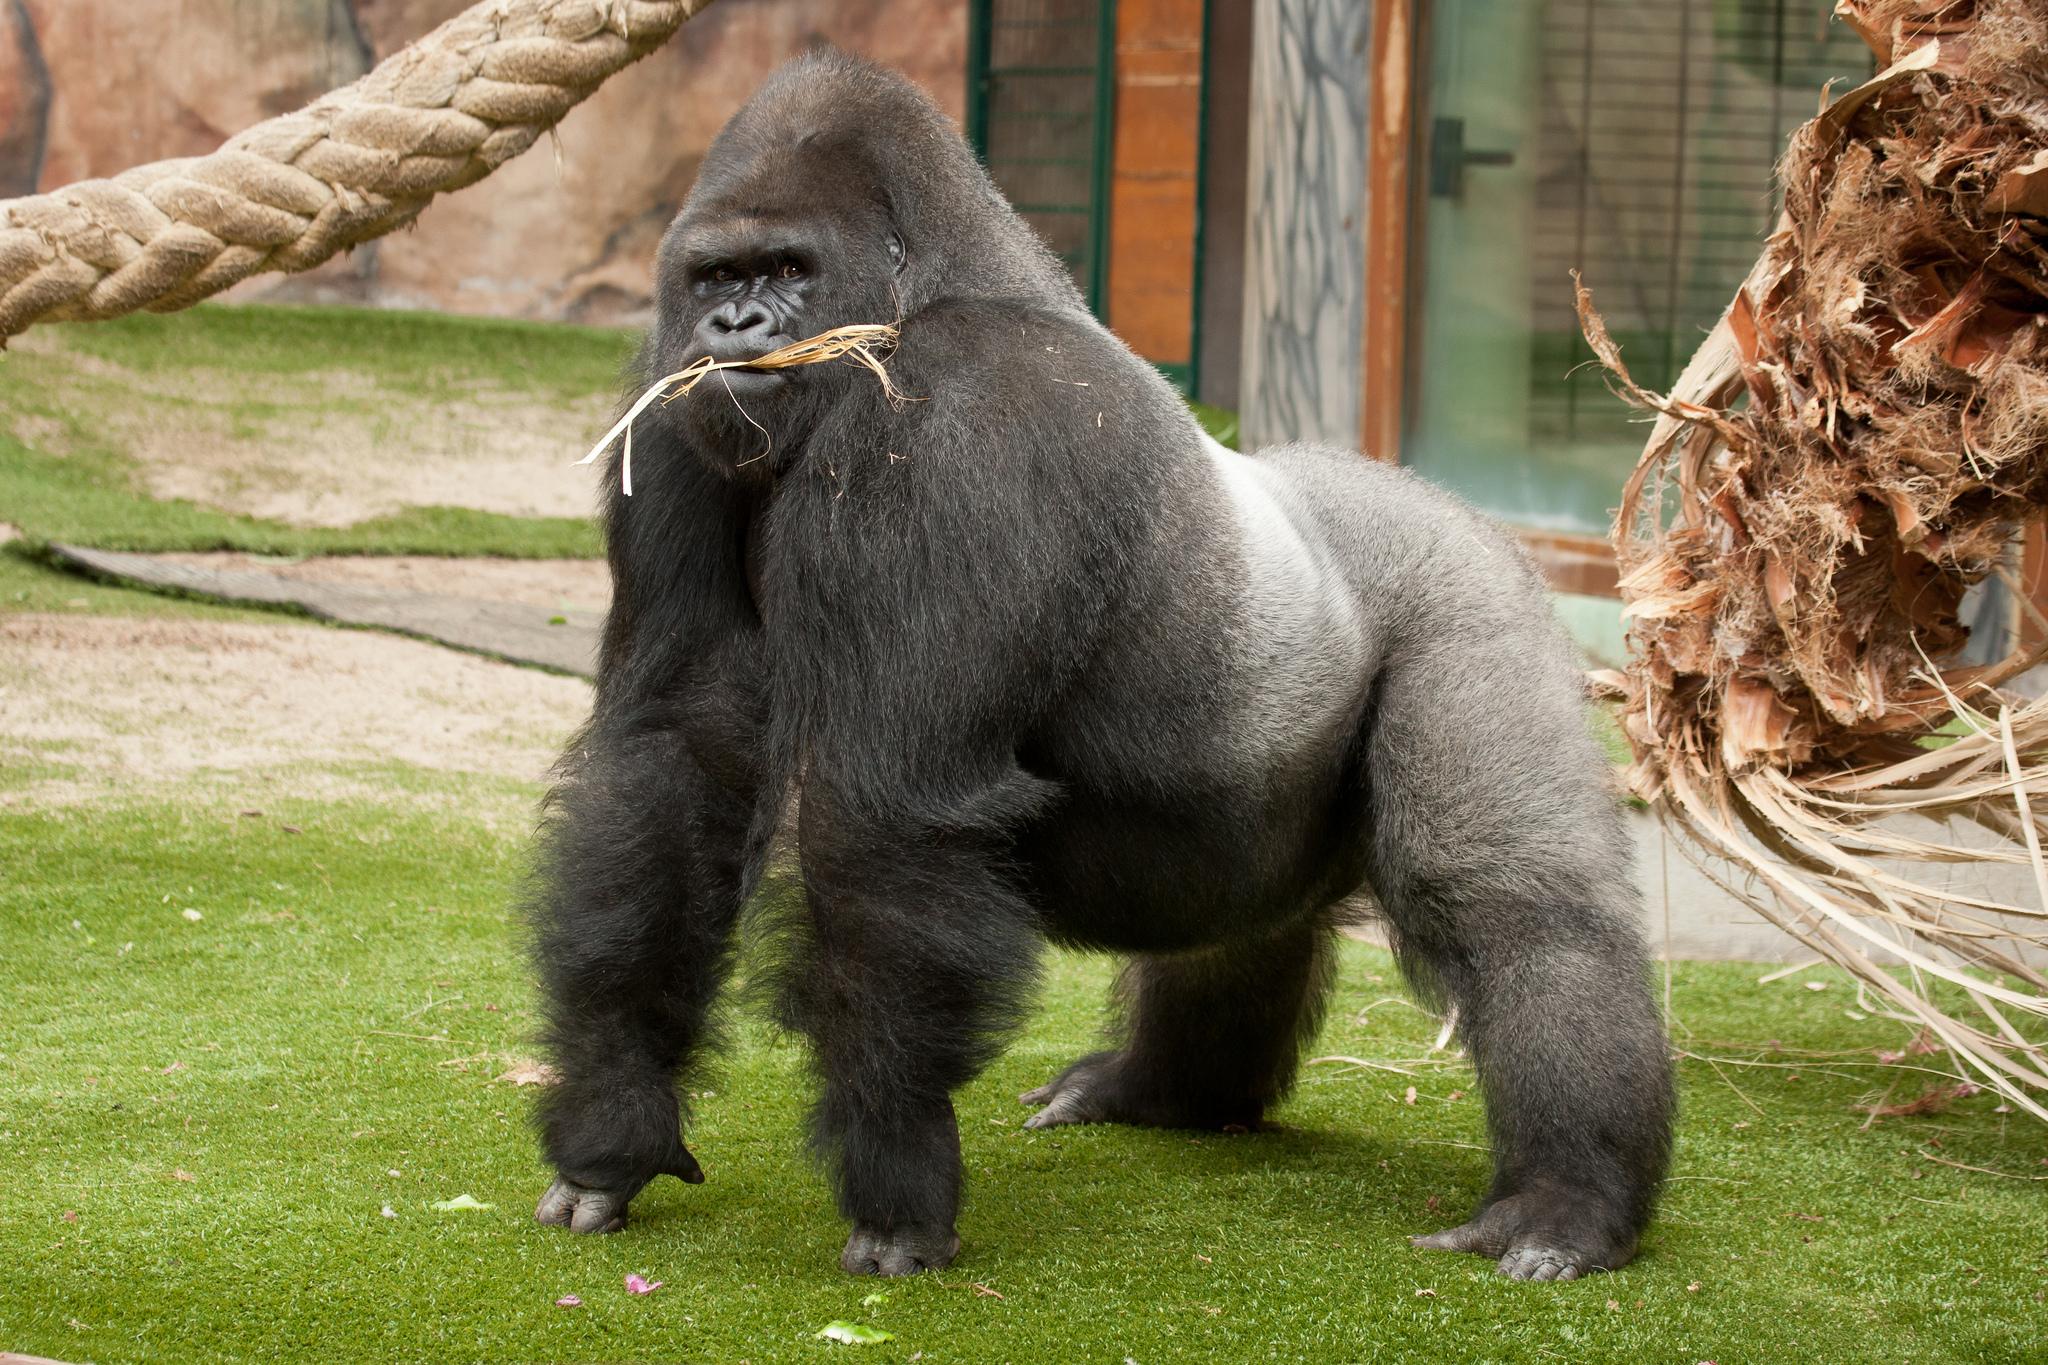 Animal   Gorilla Wallpaper 2048x1365